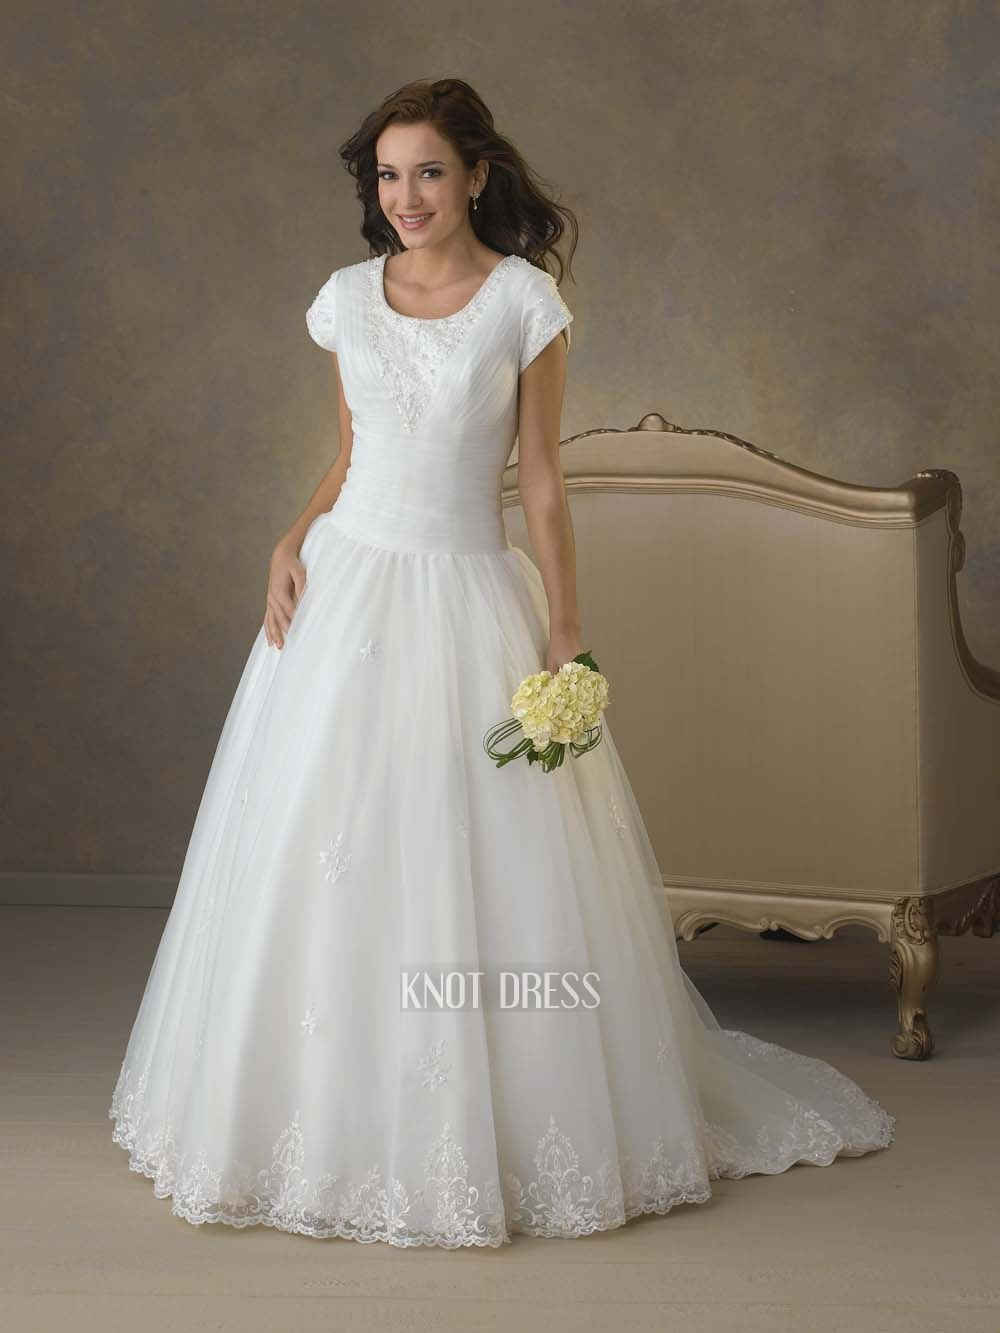 Short Sleeve A Line Wedding Dress - Cute Dresses for A Wedding Check ...